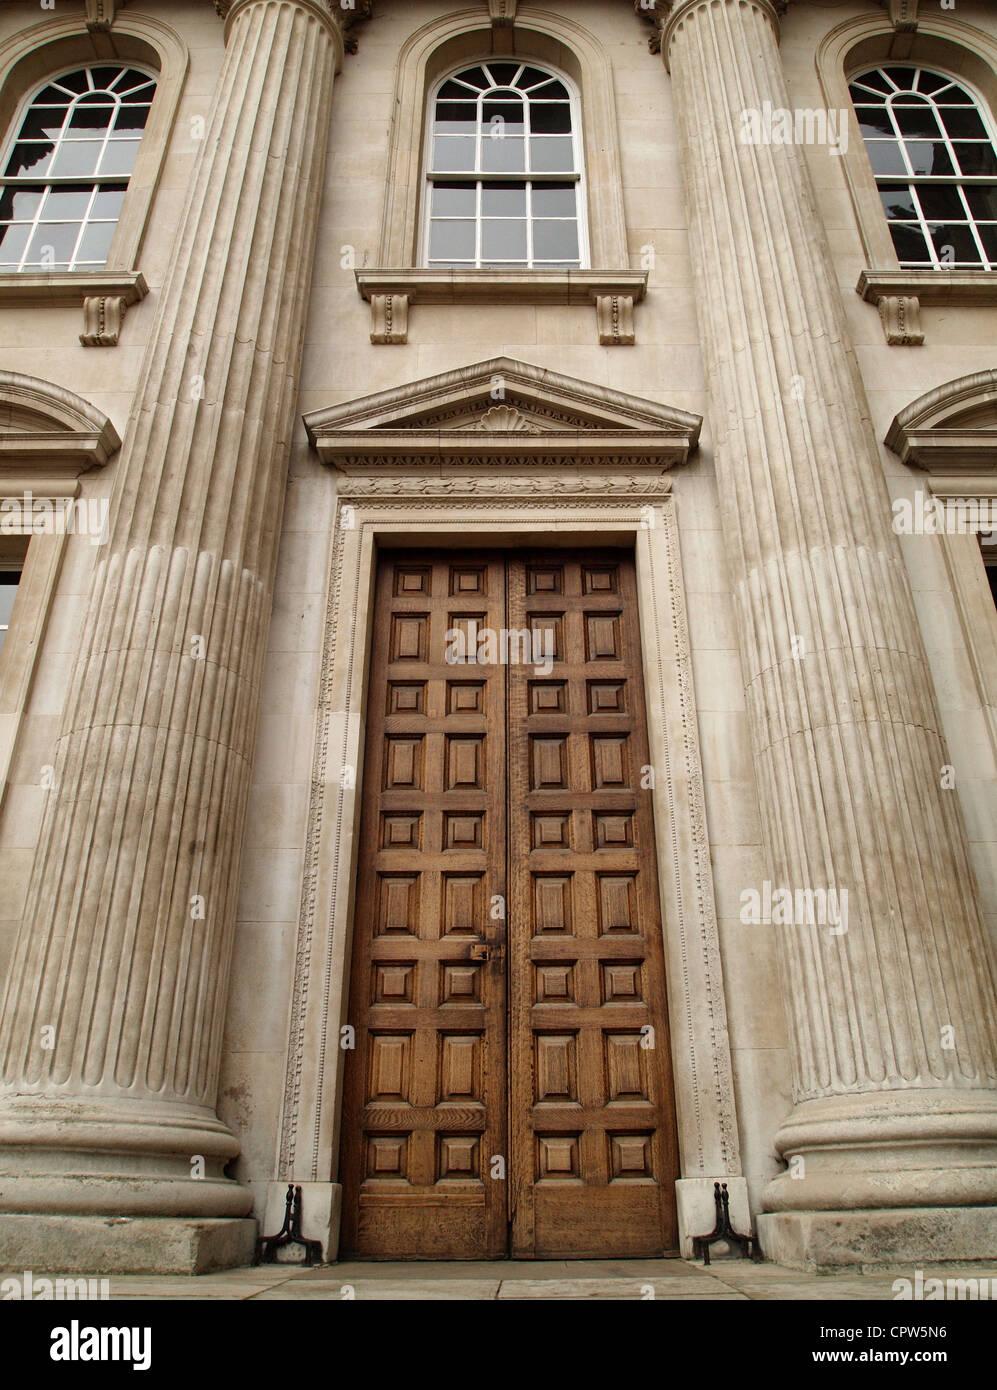 Pembroke College entrance, Cambridge - Stock Image